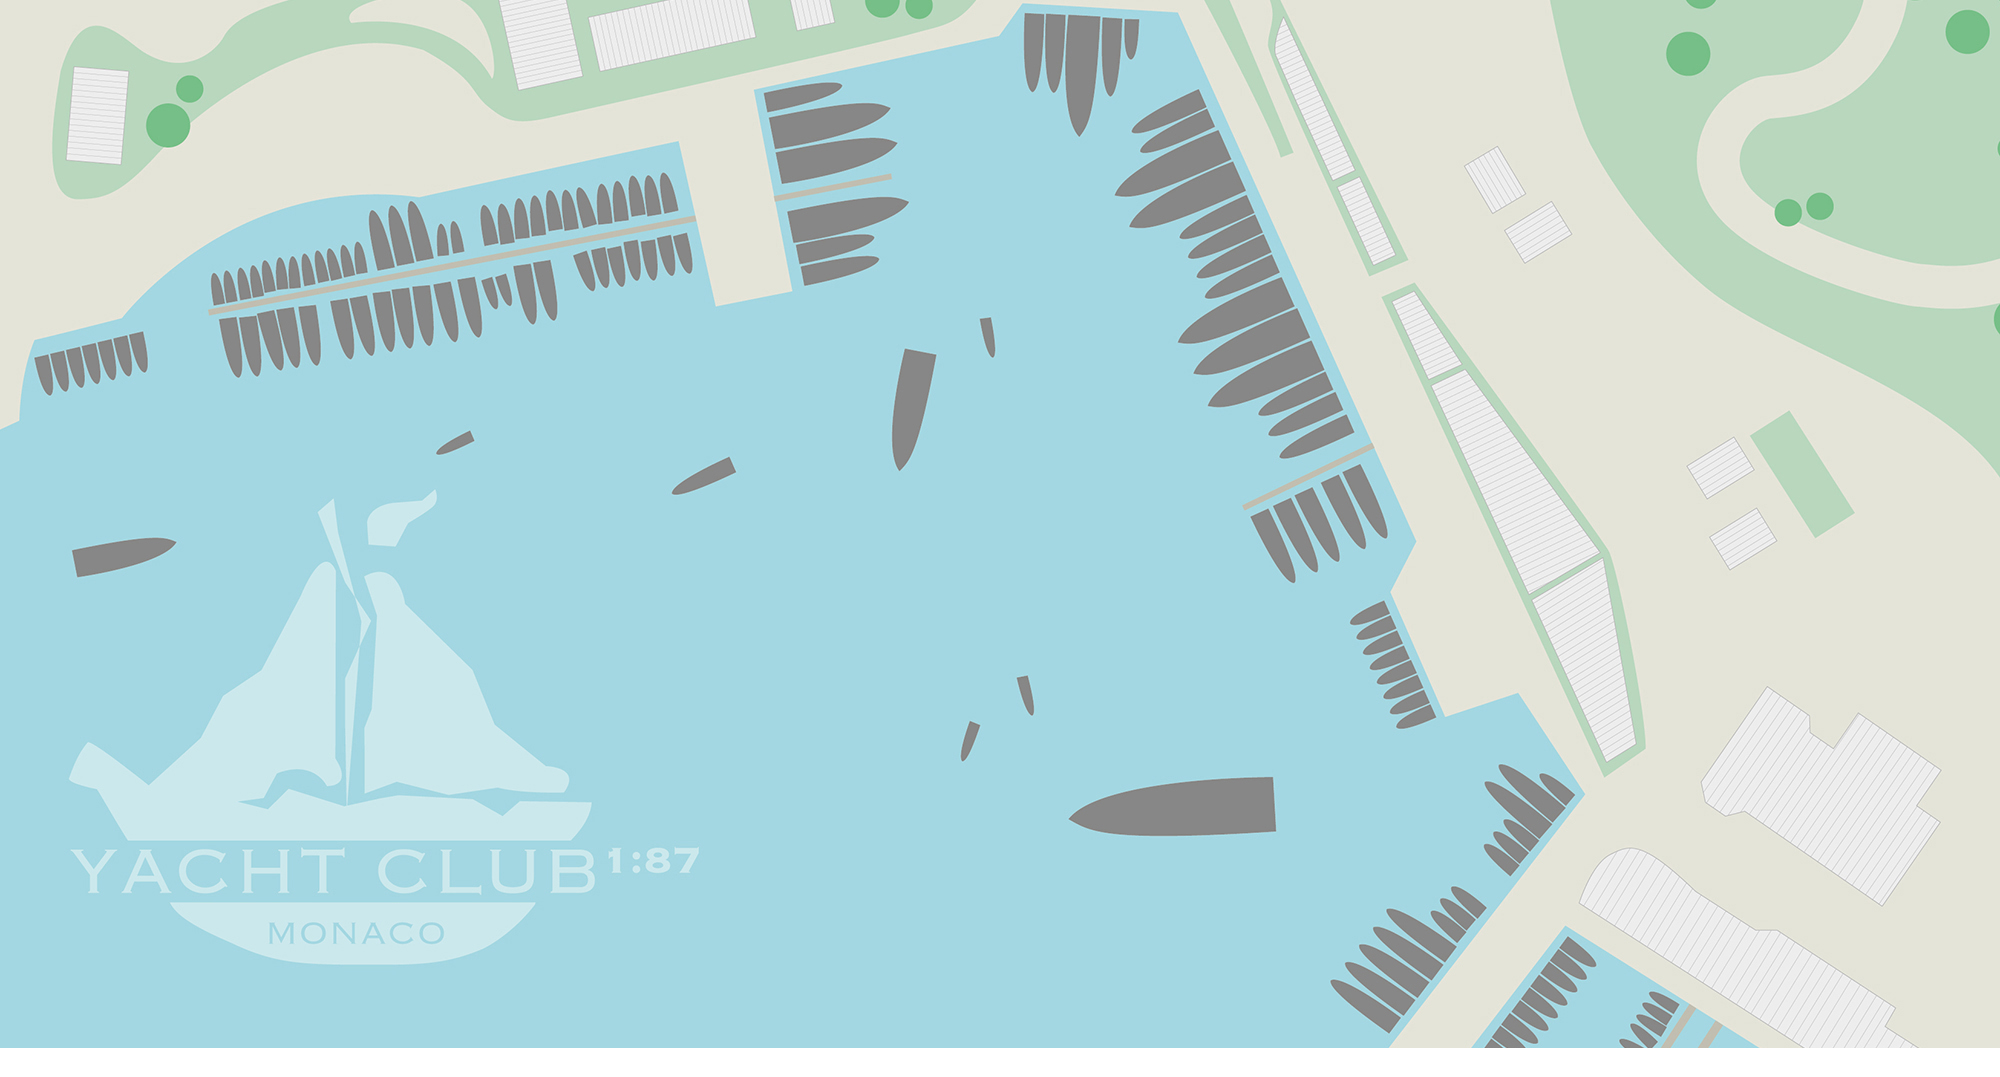 Yacht Club Monaco